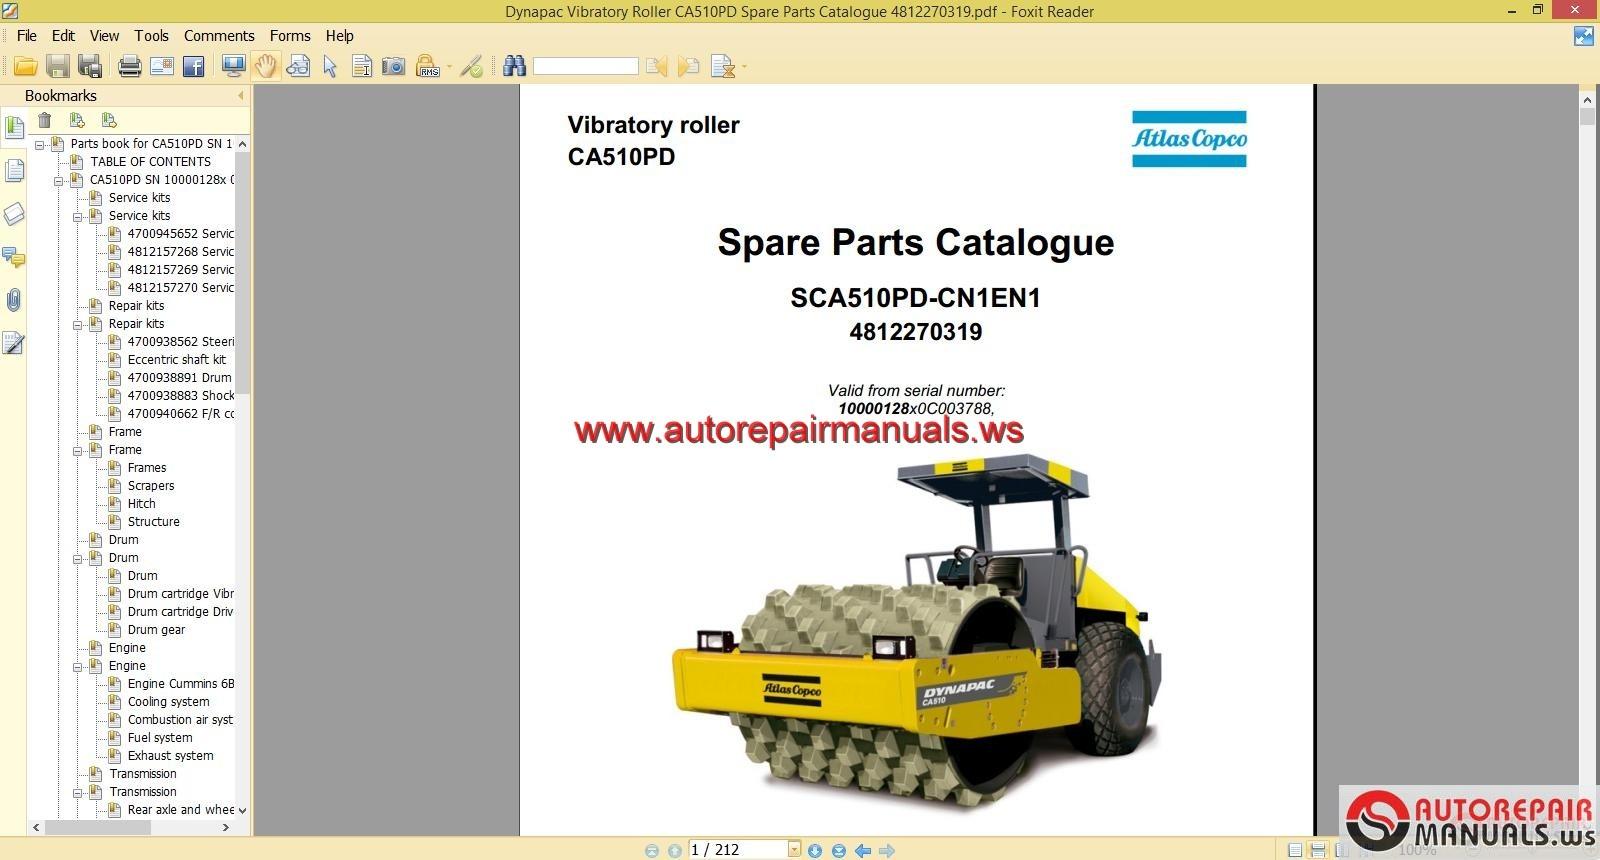 Keygen Autorepairmanuals Ws  Dynapac Vibratory Roller